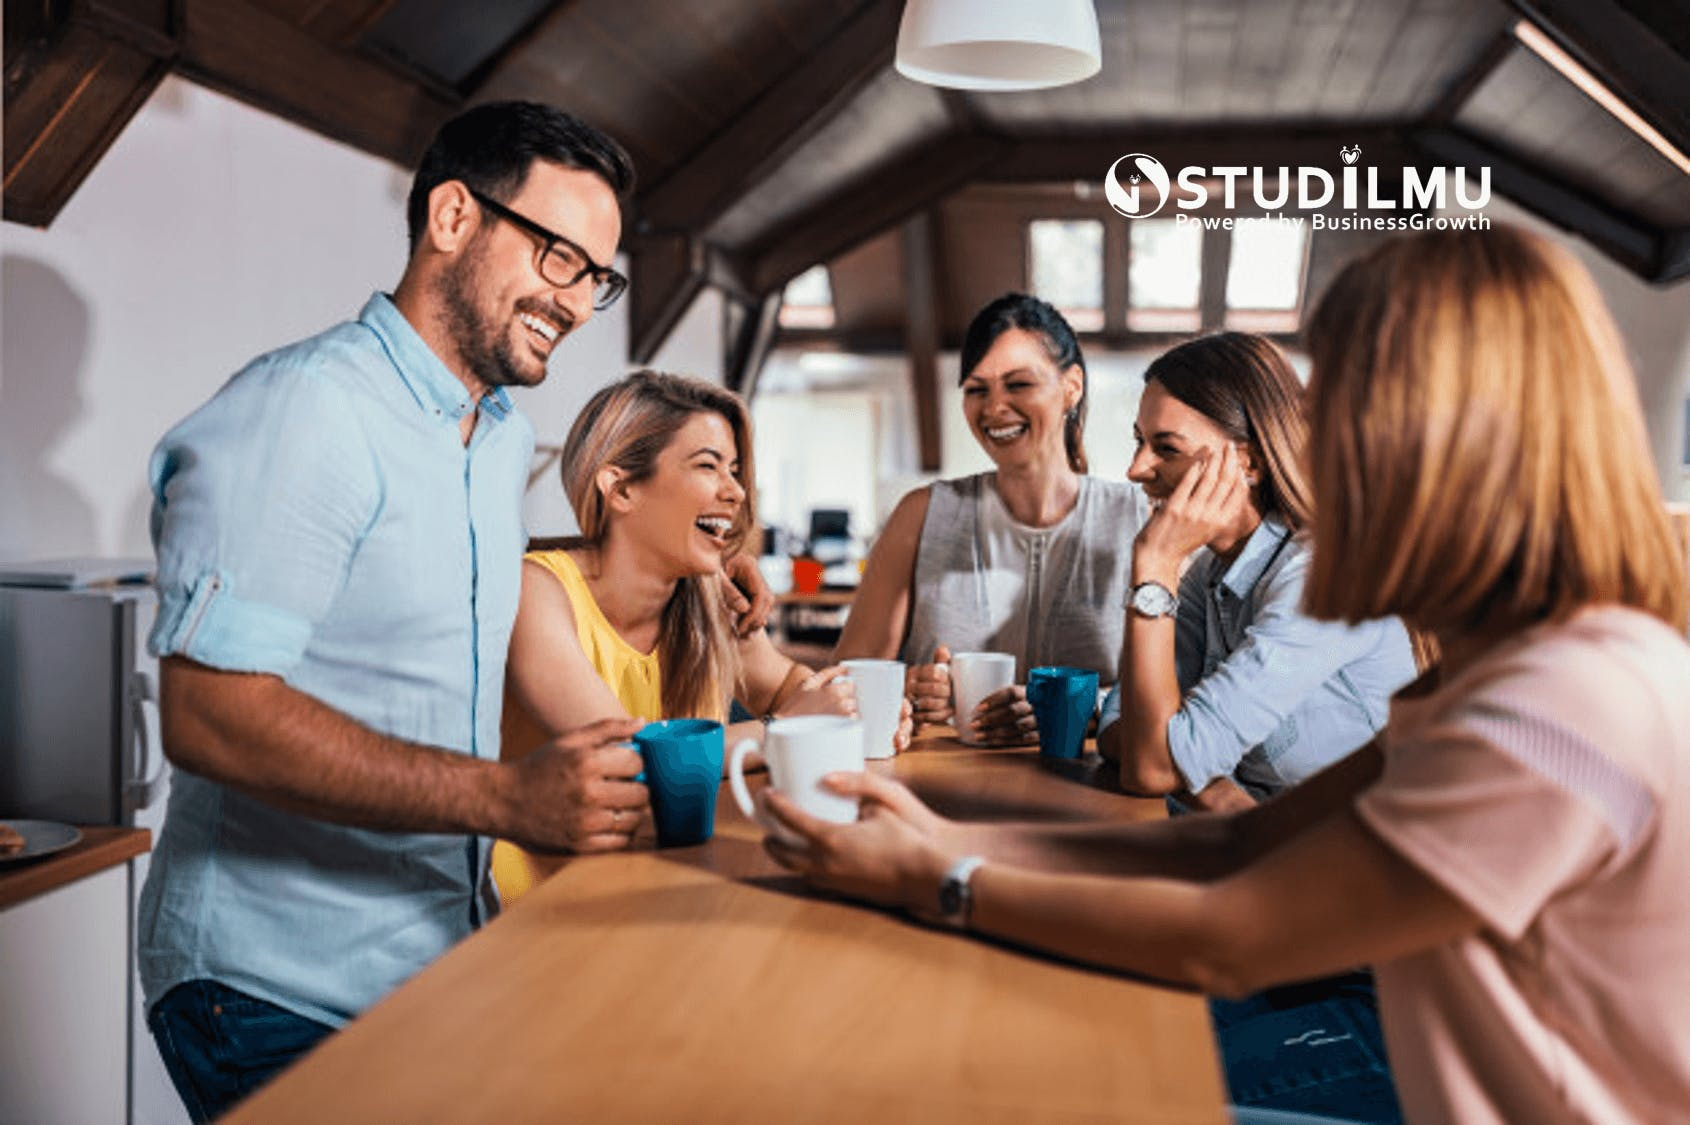 STUDILMU Career Advice - 5 Etika Berkomunikasi yang Memperkuat Budaya Perusahaan